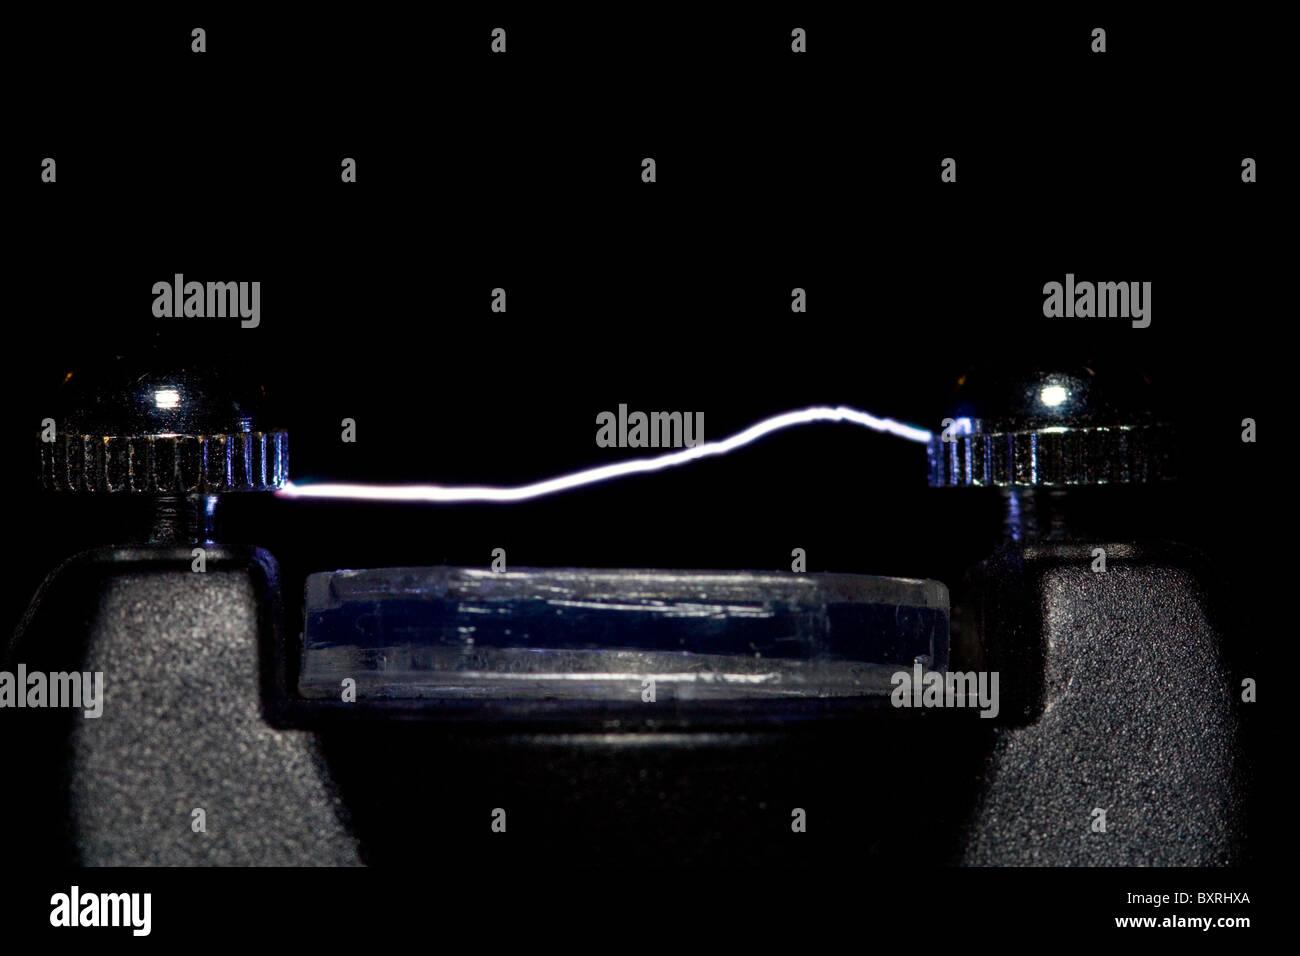 Stun Gun And Electricity Stock Photos & Stun Gun And